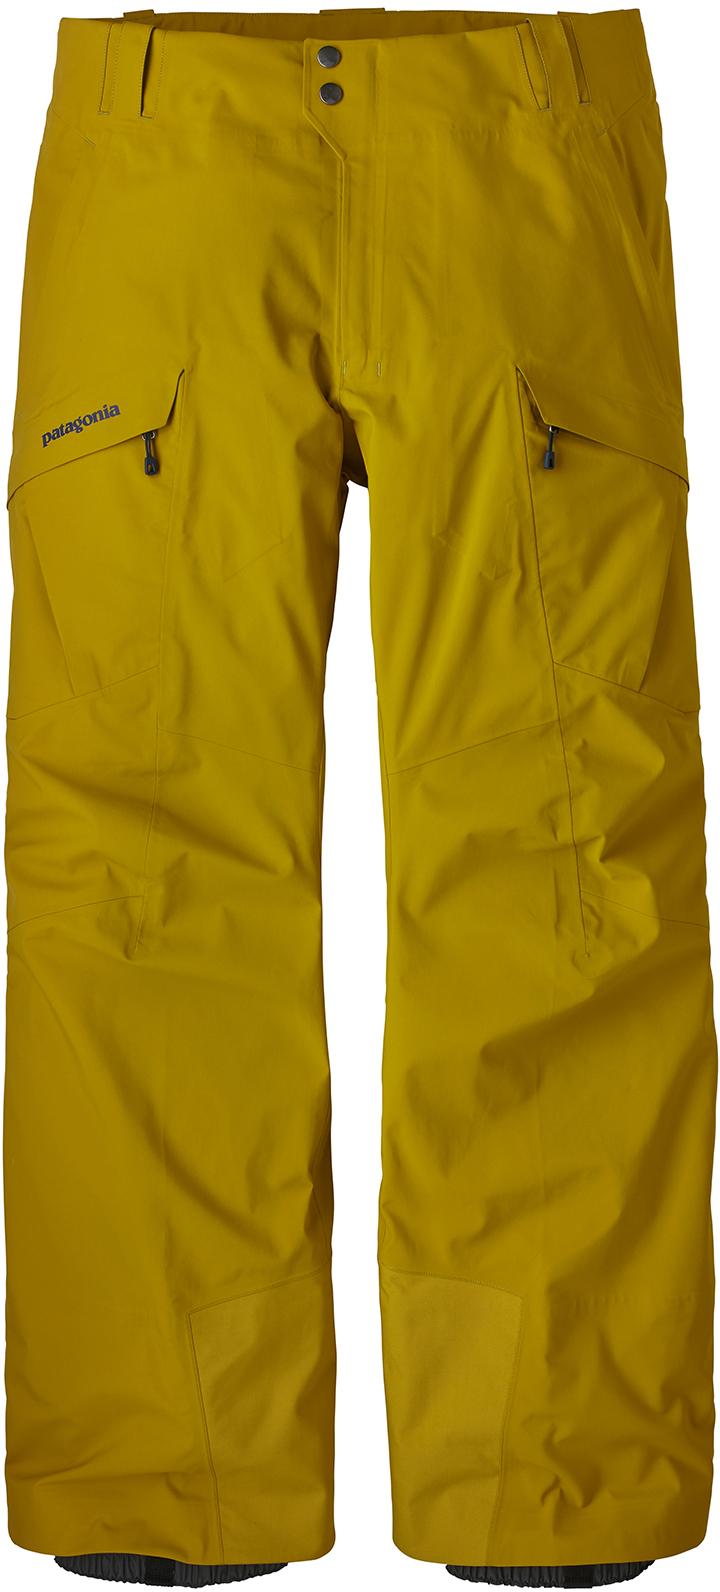 1fafc70ab30 Pantalons de ski et de neige